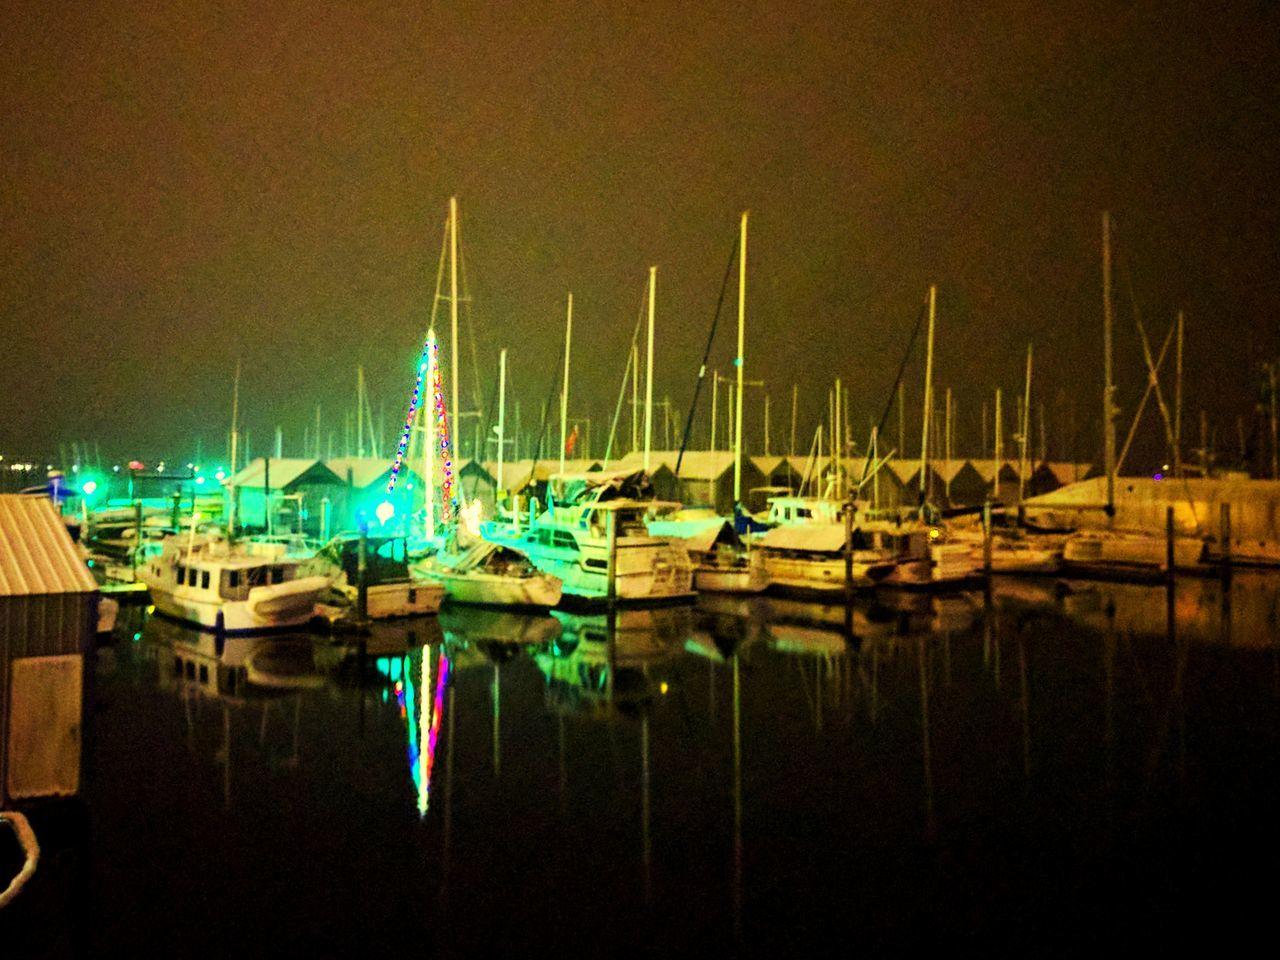 nautical vessel, moored, water, reflection, boat, no people, transportation, harbor, mode of transport, marina, outdoors, night, illuminated, yacht, waterfront, sailboat, lake, mast, clear sky, nature, sky